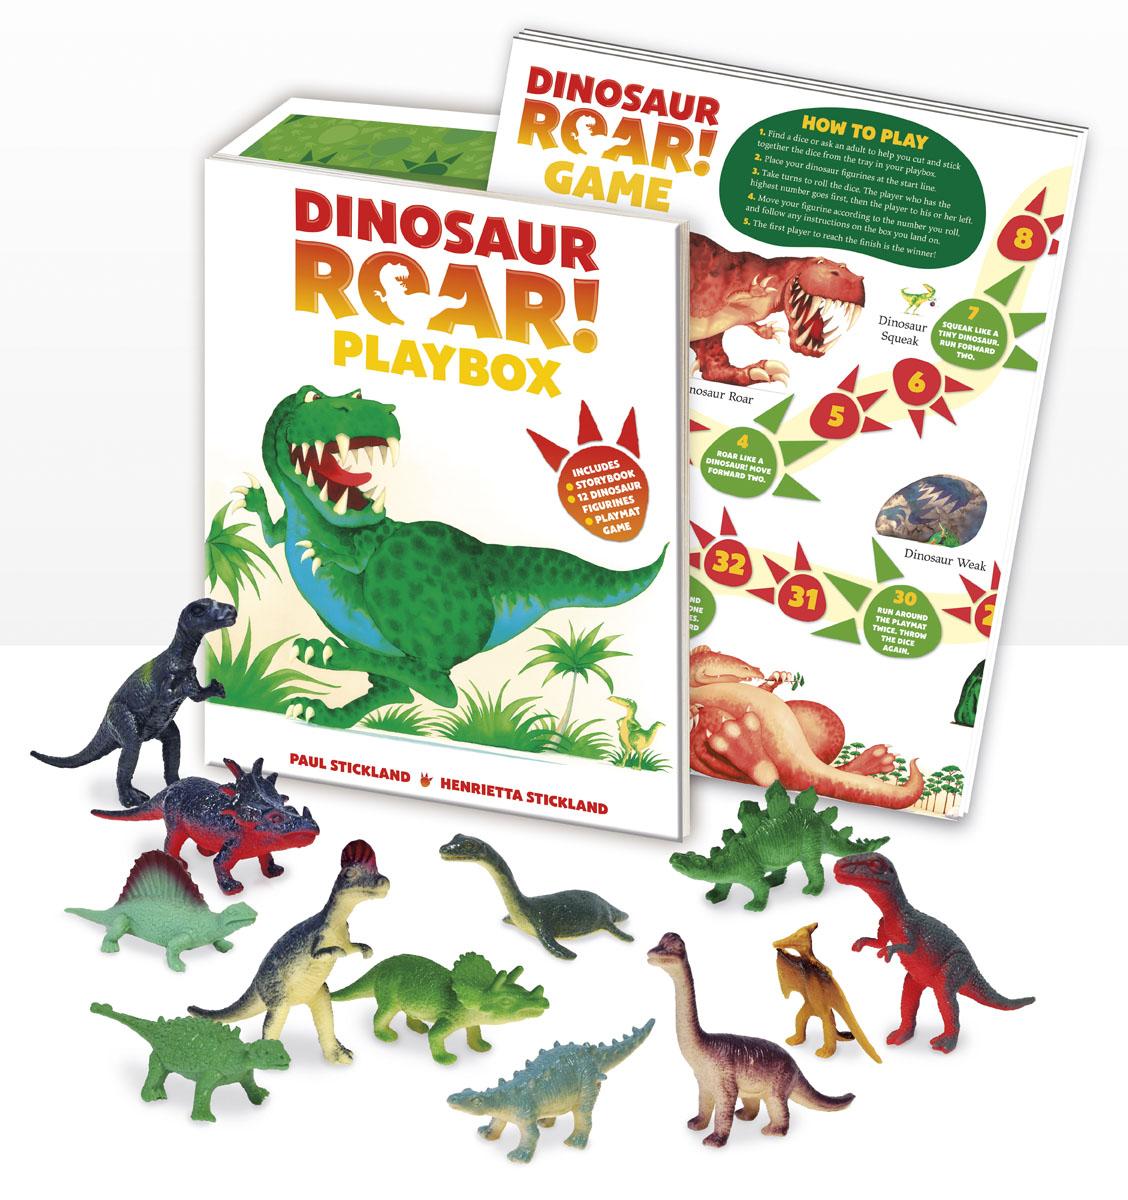 Dinosaur Roar! dinosaur animals model winder hunter utahraptor classic toys for boys children with retail box